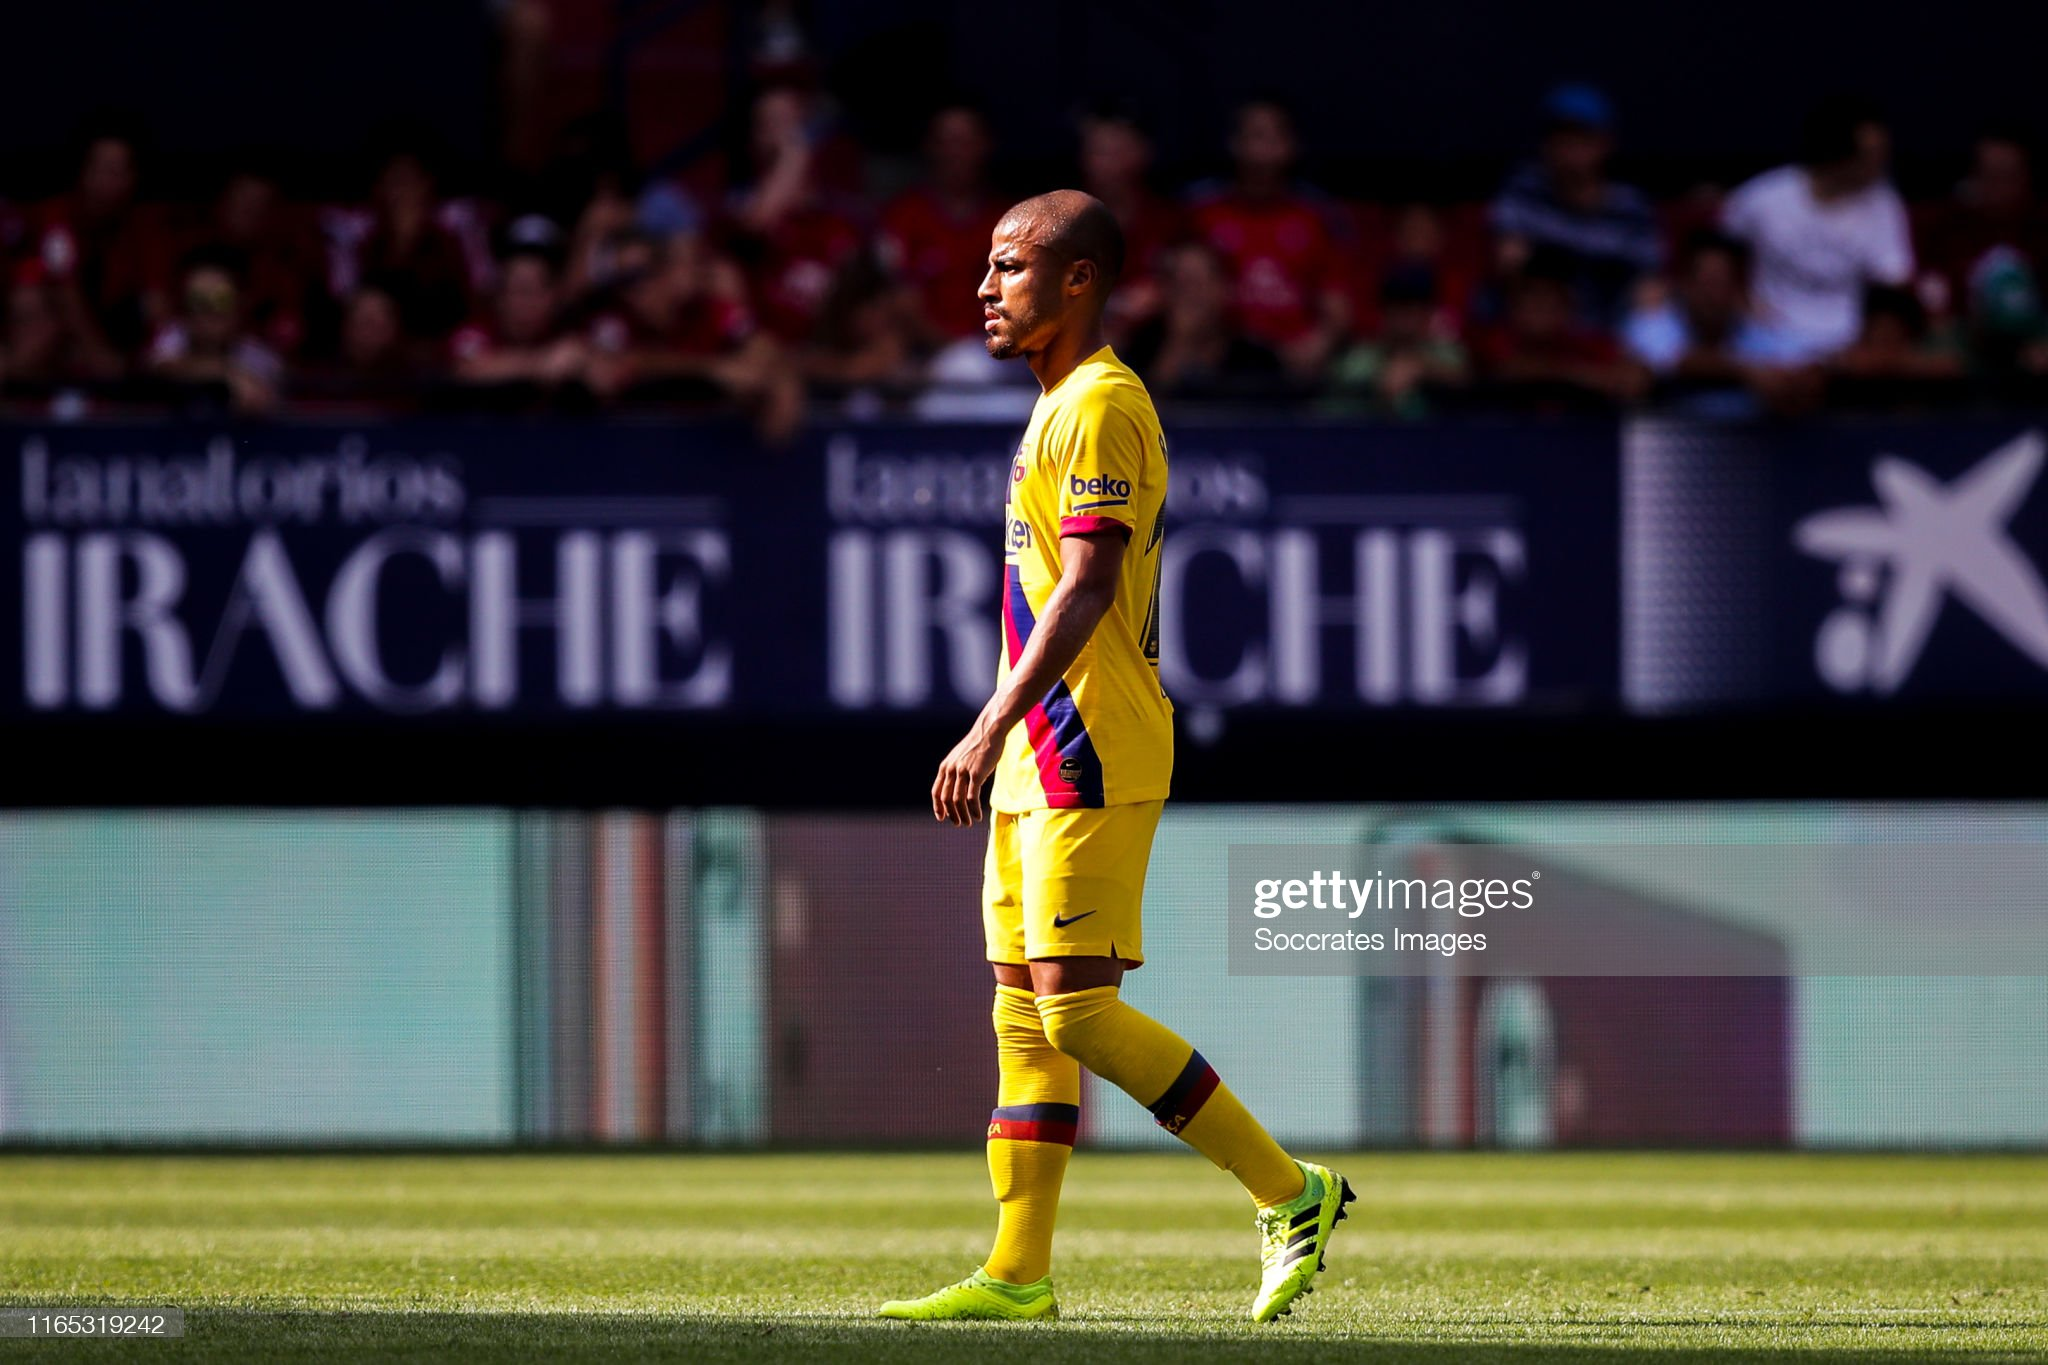 صور مباراة : أوساسونا - برشلونة 2-2 ( 31-08-2019 )  Rafinha-of-fc-barcelona-during-the-la-liga-santander-match-between-v-picture-id1165319242?s=2048x2048